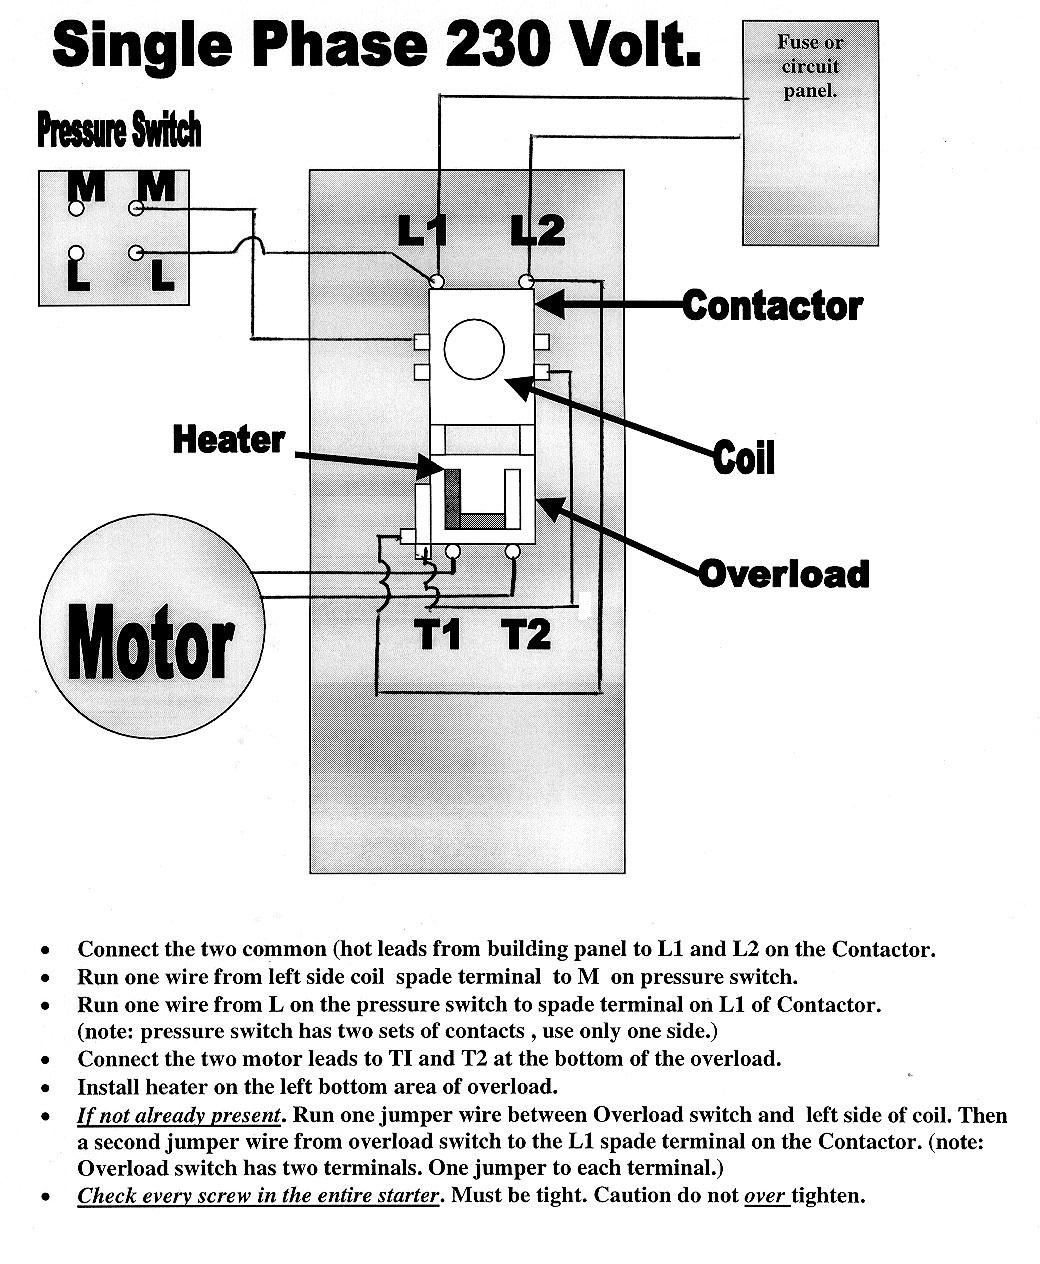 220V Single Phase Motor Wiring Diagram   Manual E-Books - 220V Single Phase Motor Wiring Diagram